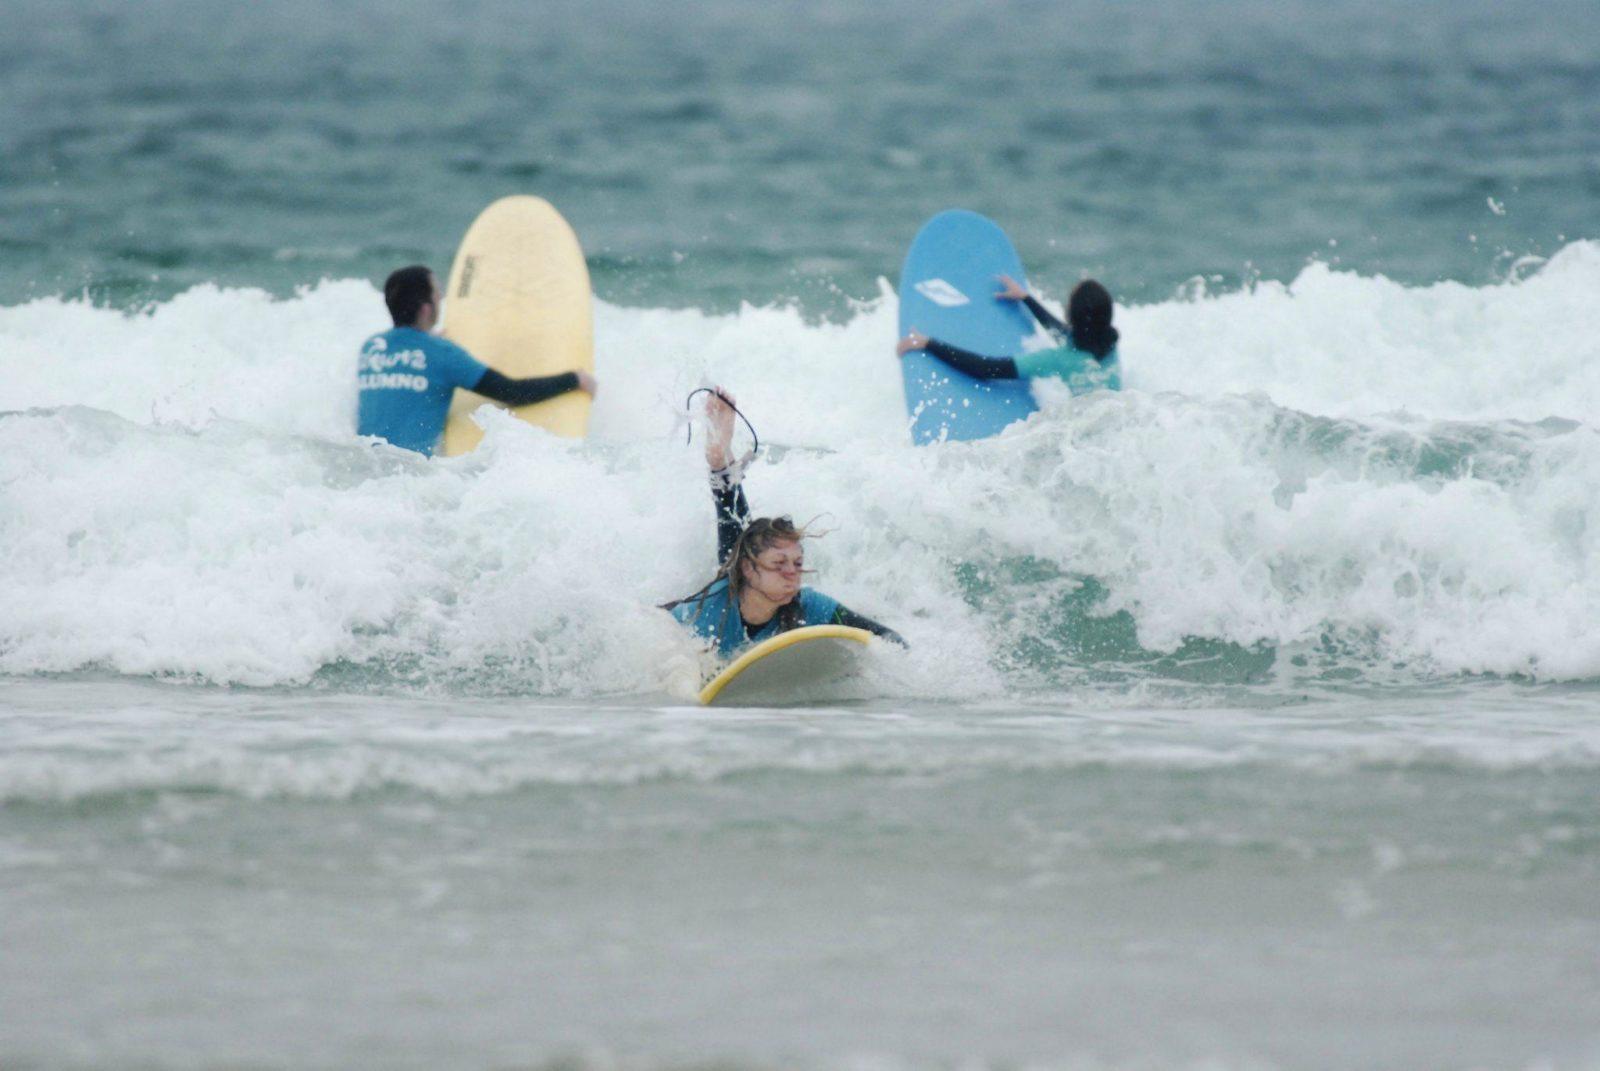 Surf trip packing list